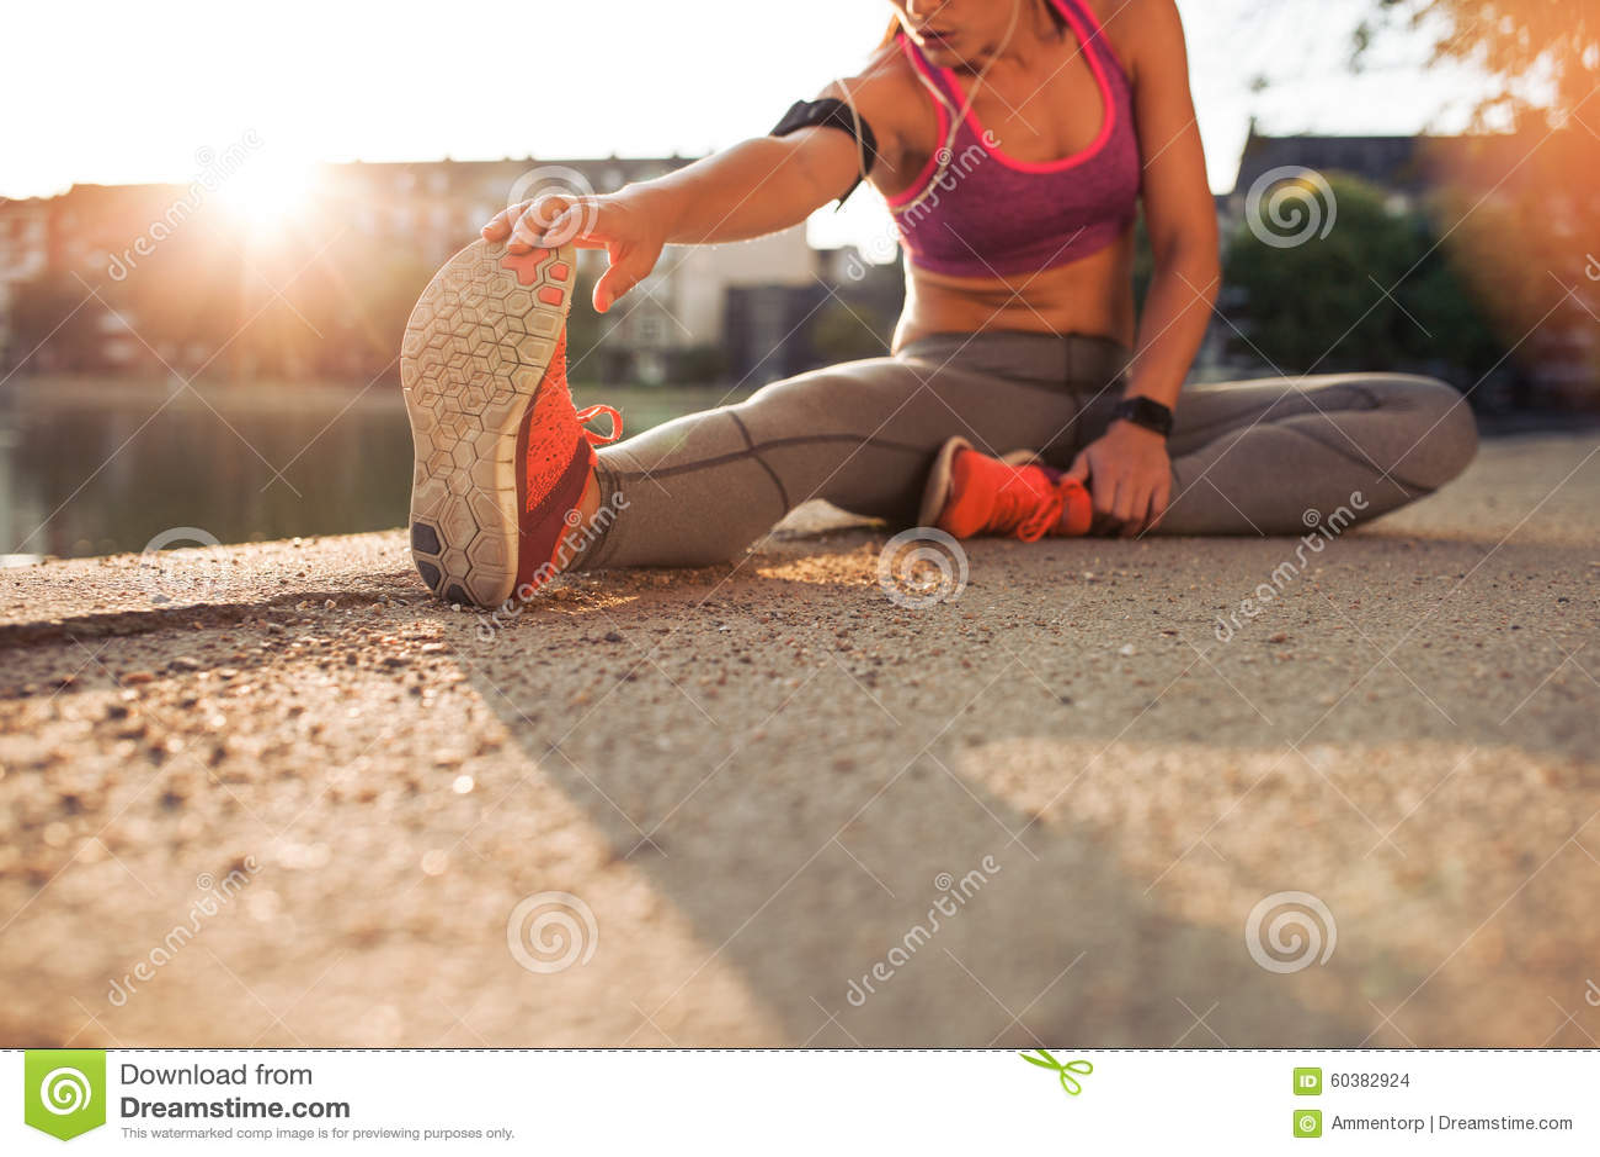 Atleta de sexo femenino que estira las piernas